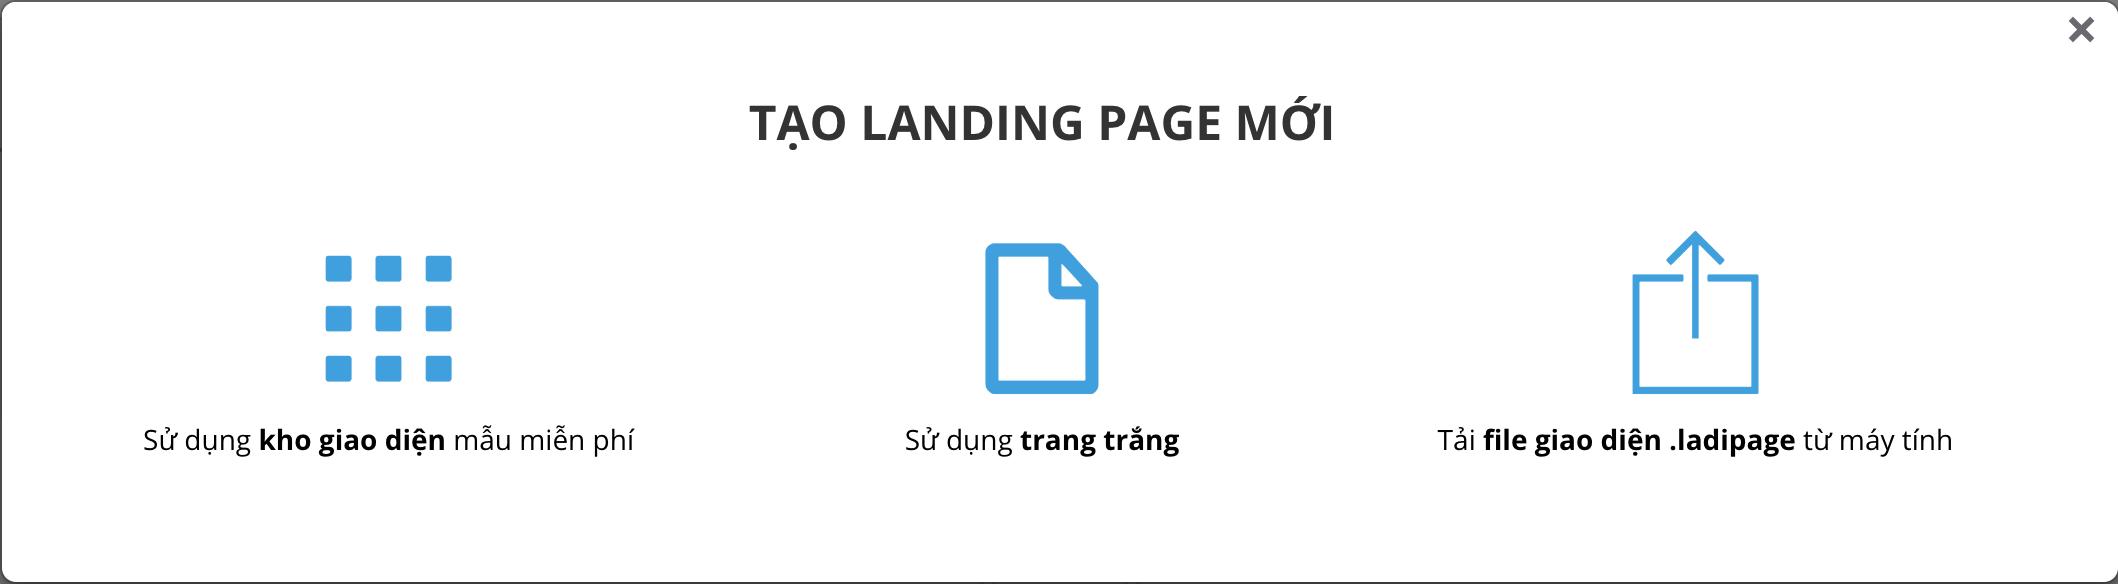 wikivps-chọn loại landing page